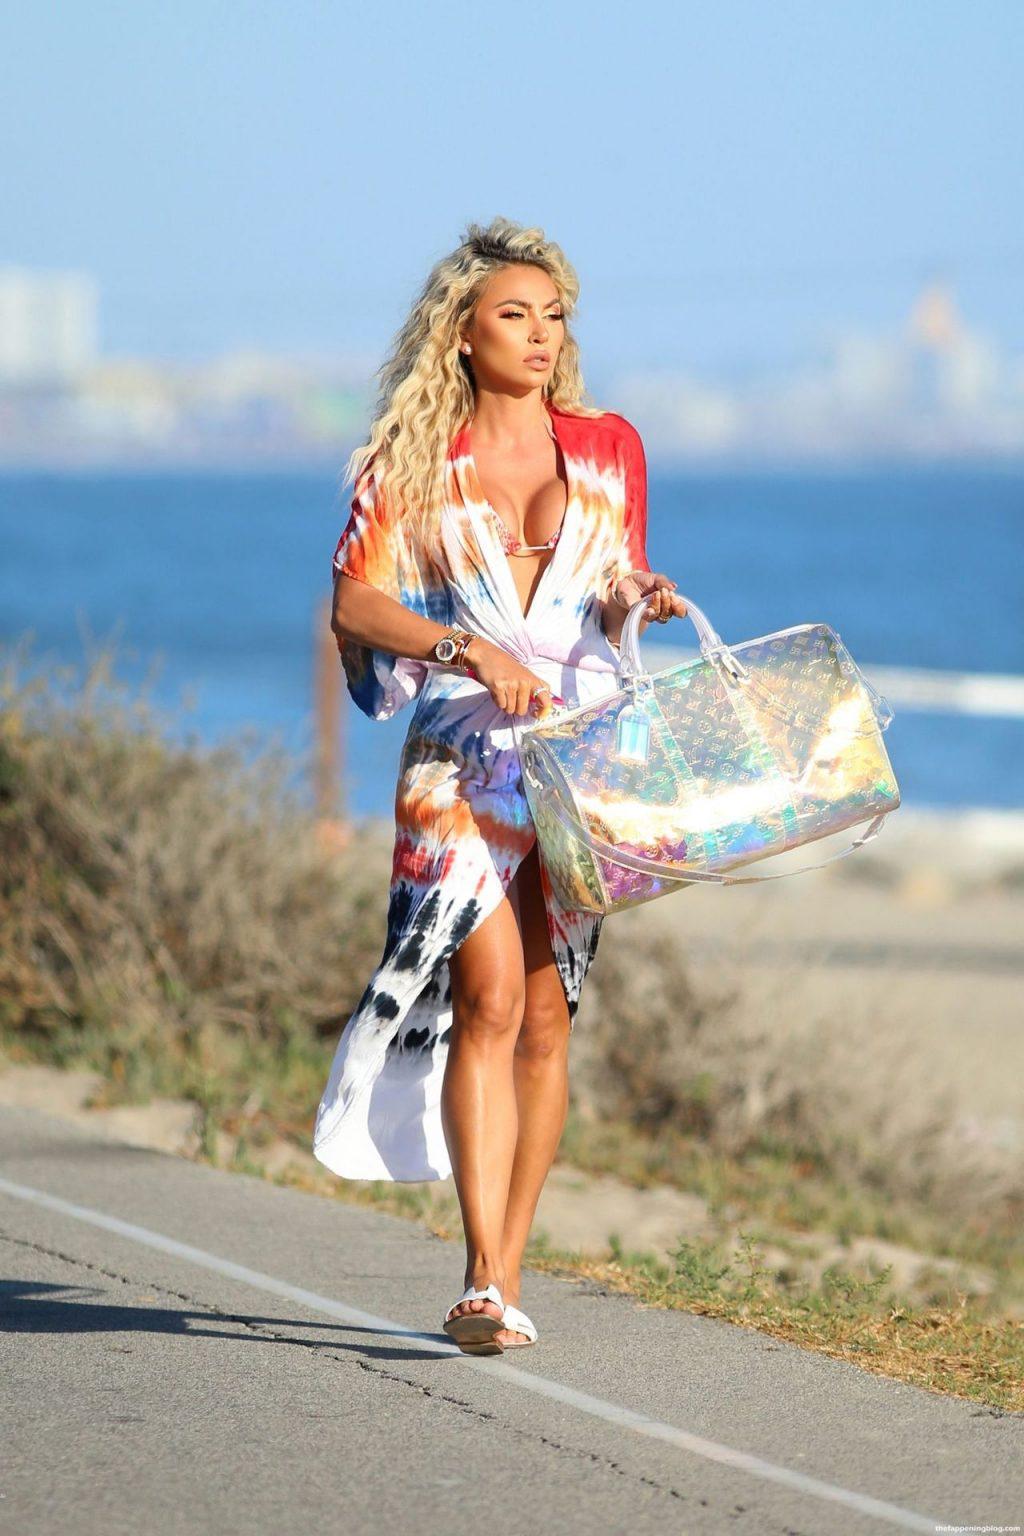 Khloe Terae Shows Off Her Sensational Body as She Hits the Beach in Santa Monica (47 Photos)